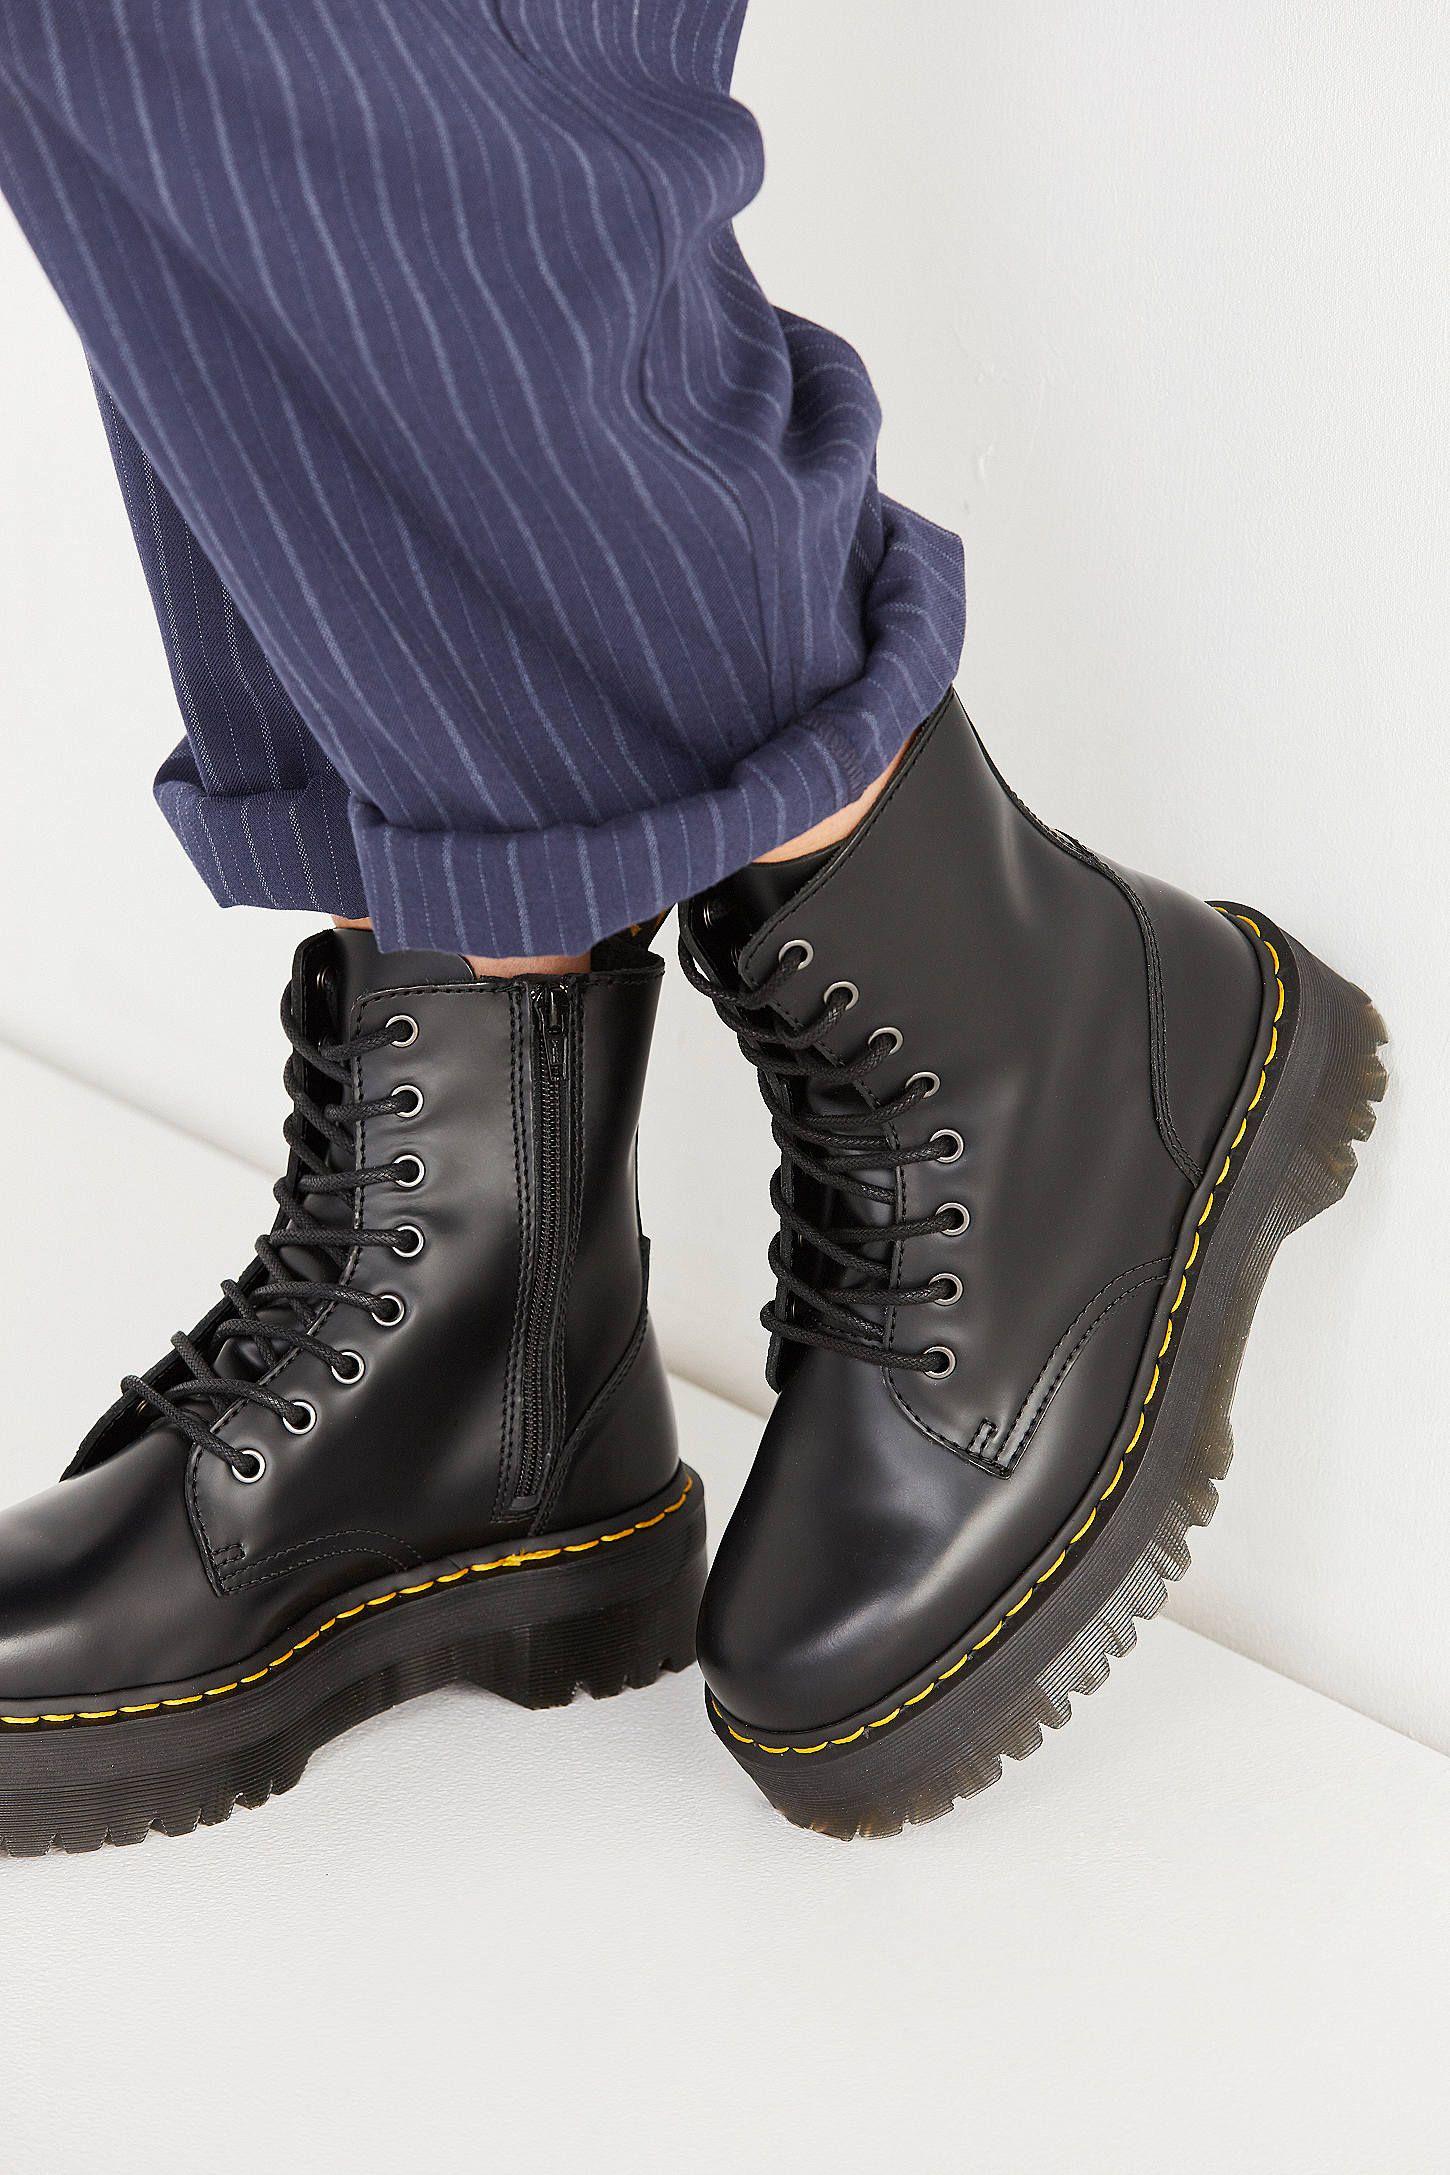 3c6662eadb46 Dr. Martens Jadon Platform 8-Eye Boot